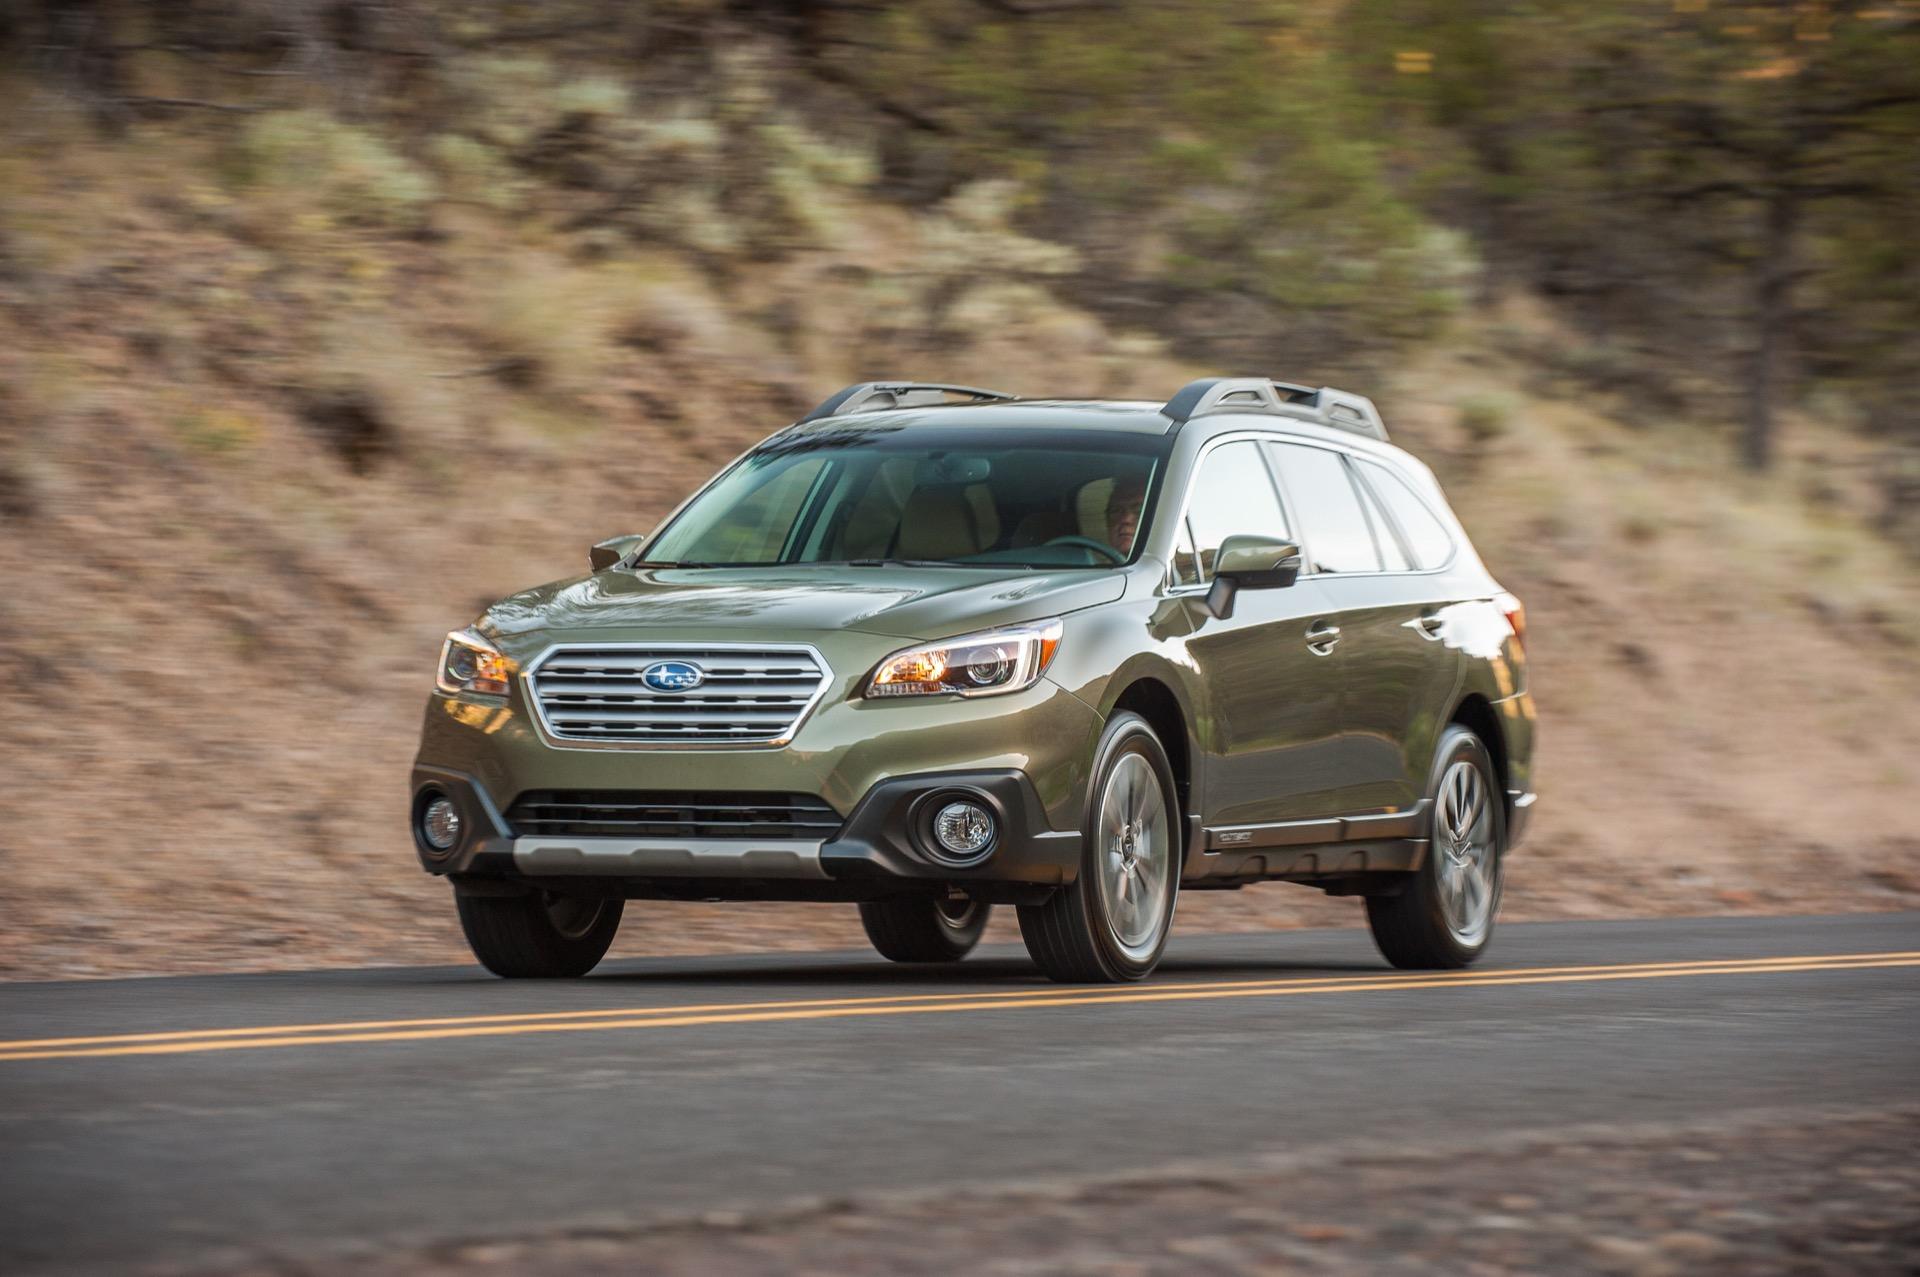 2016 Subaru Outback 100512694 H Jpg